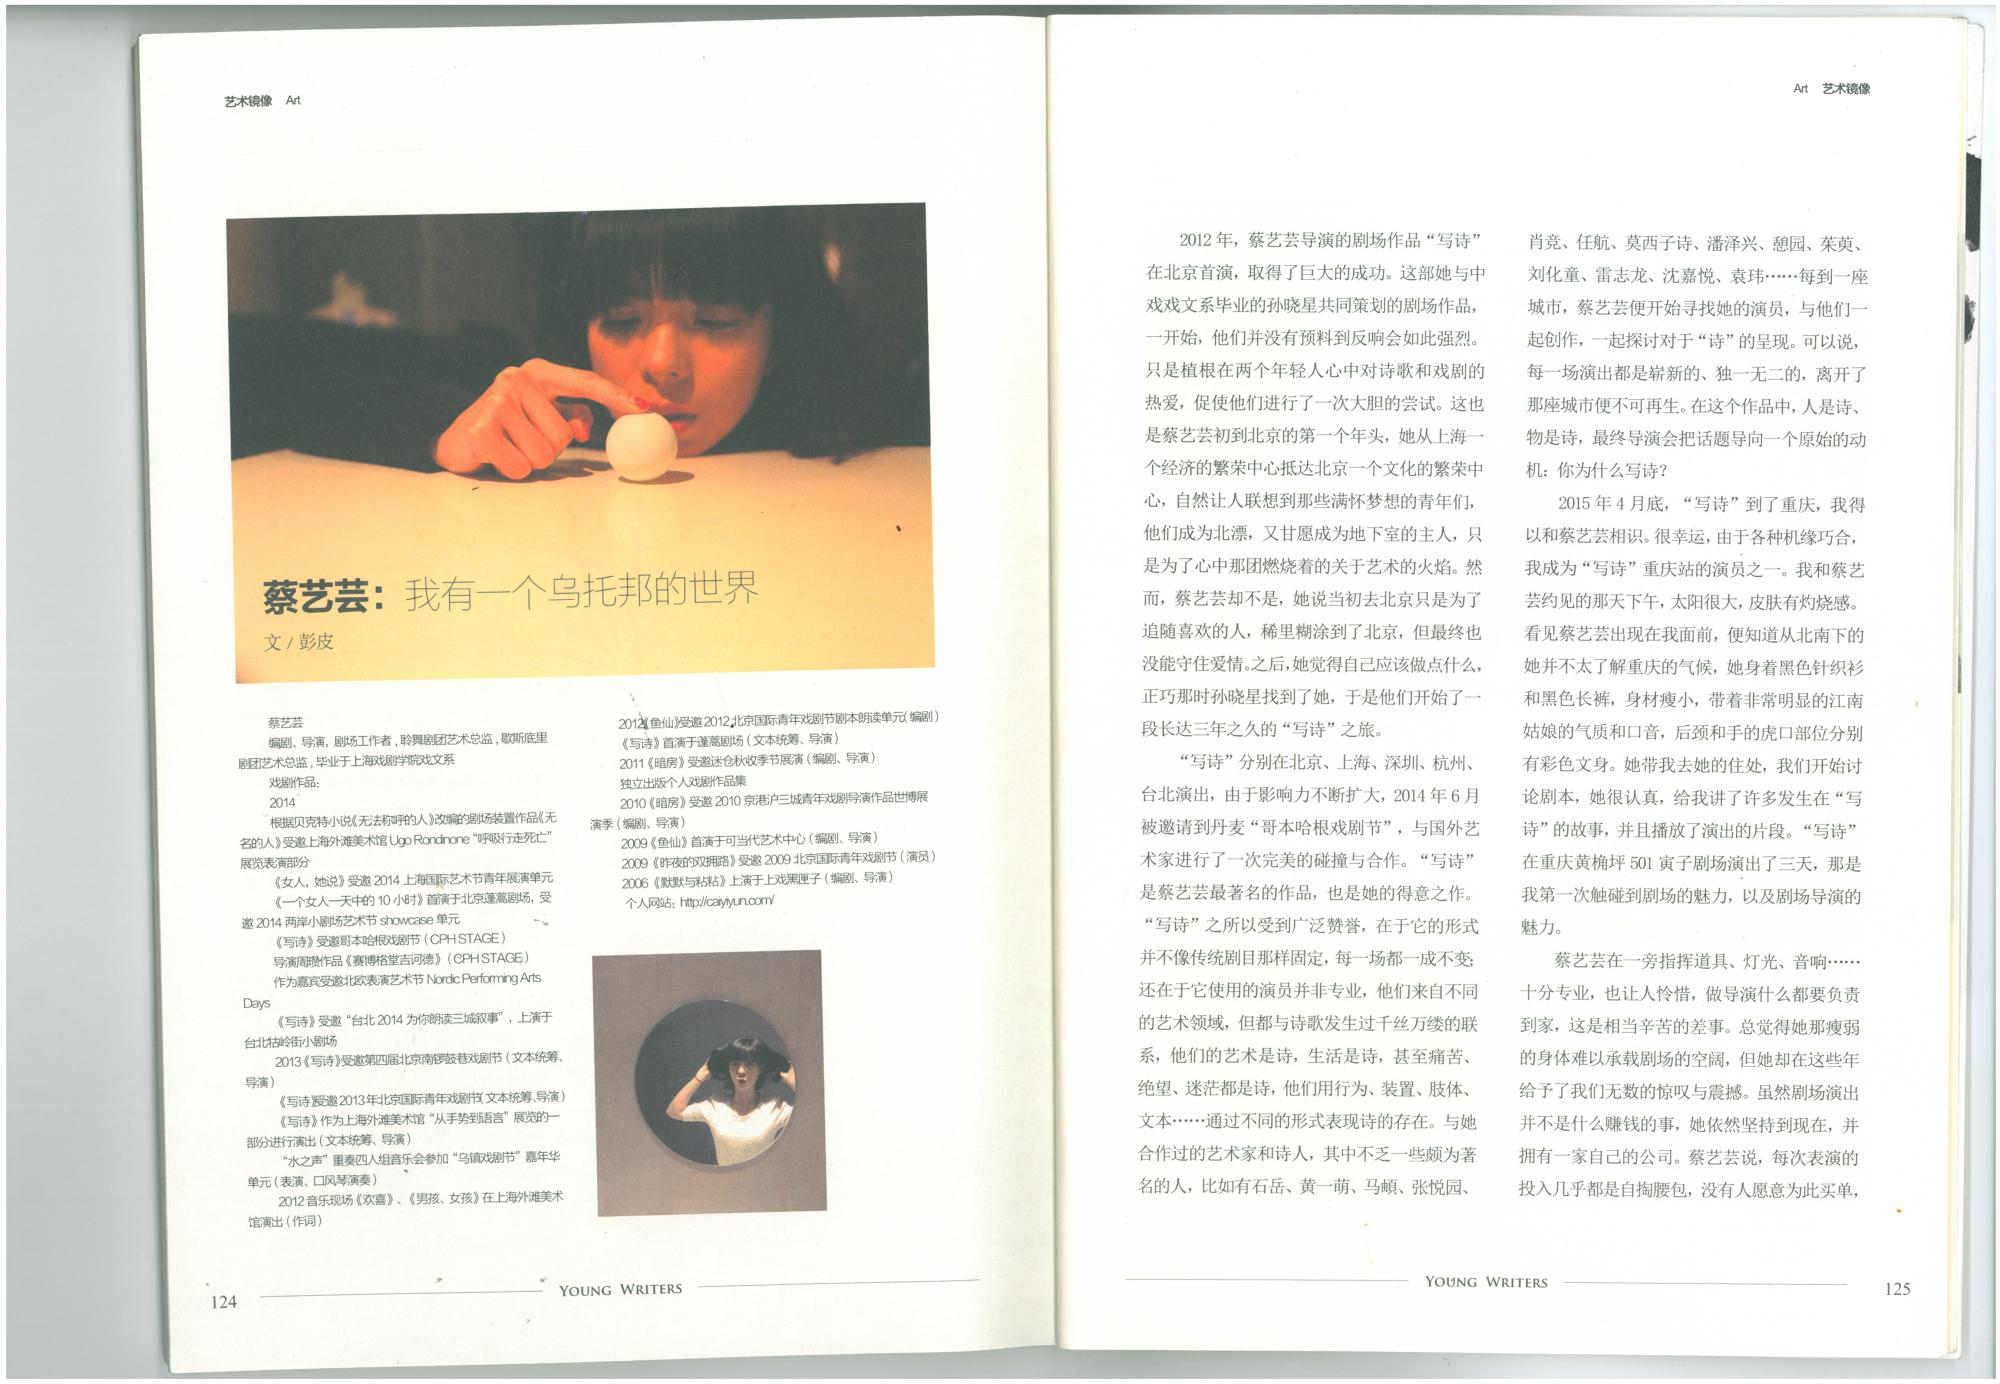 http://caiyiyun.com/files/gimgs/33_s45c-315081022571.jpg